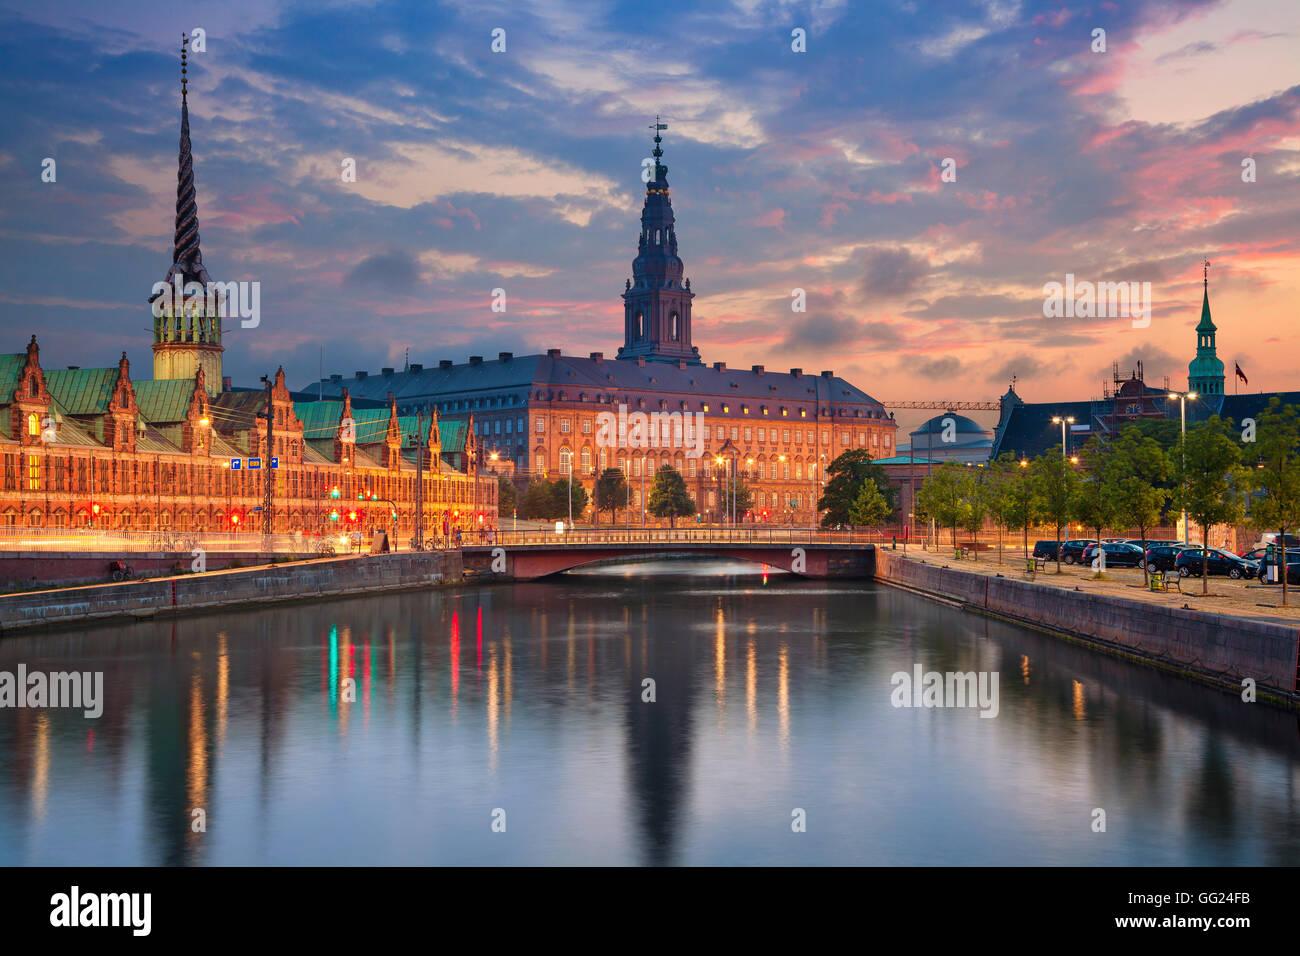 Copenhague. Imagen de Copenhague, Dinamarca, durante la hora azul crepúsculo. Imagen De Stock